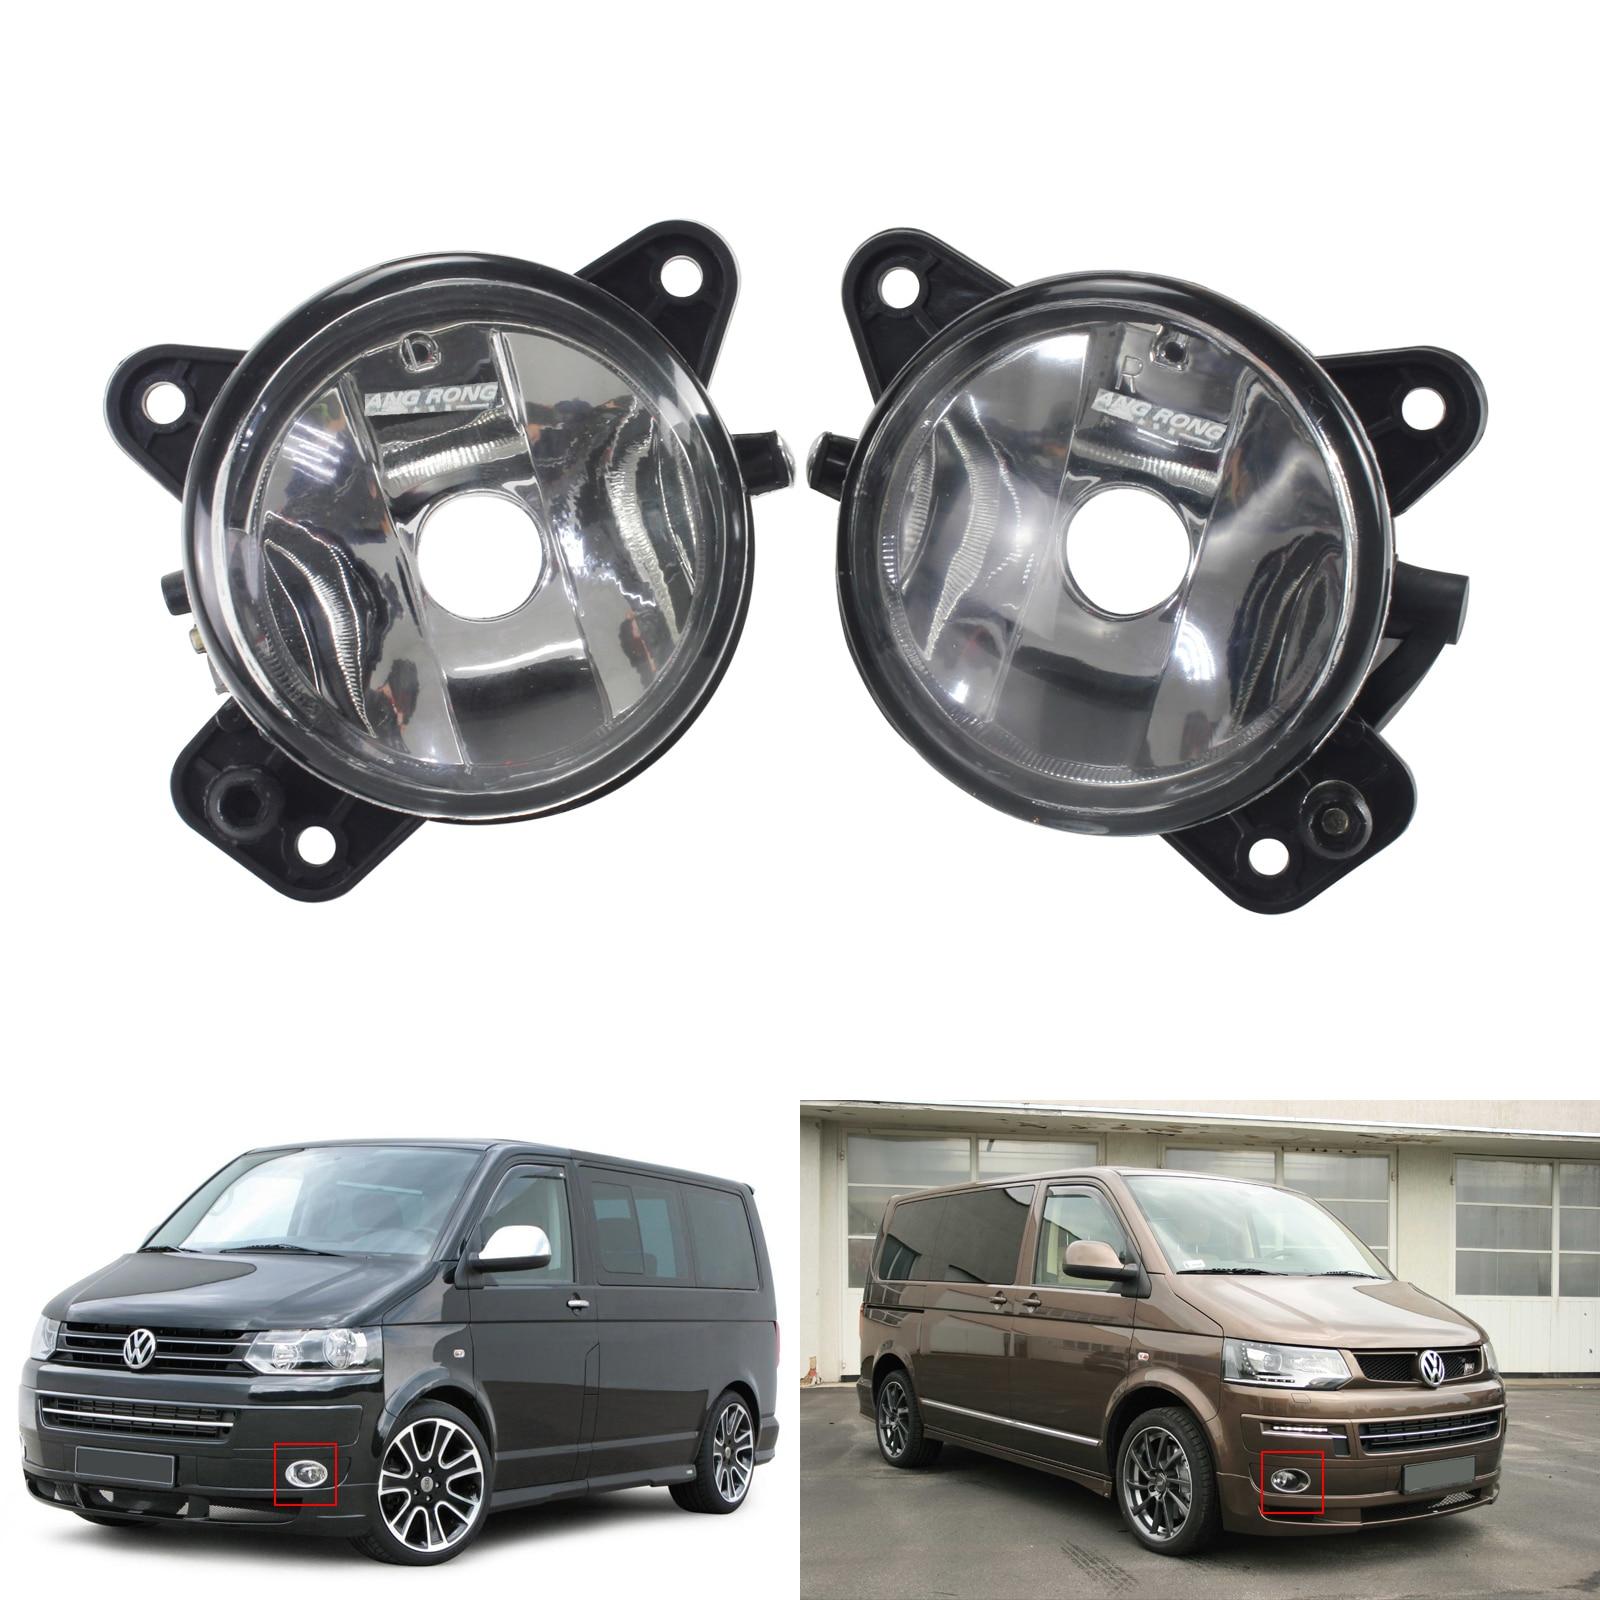 2x VW Transporter MK5 Genuine Osram Original Number Plate Lamp Light Bulbs